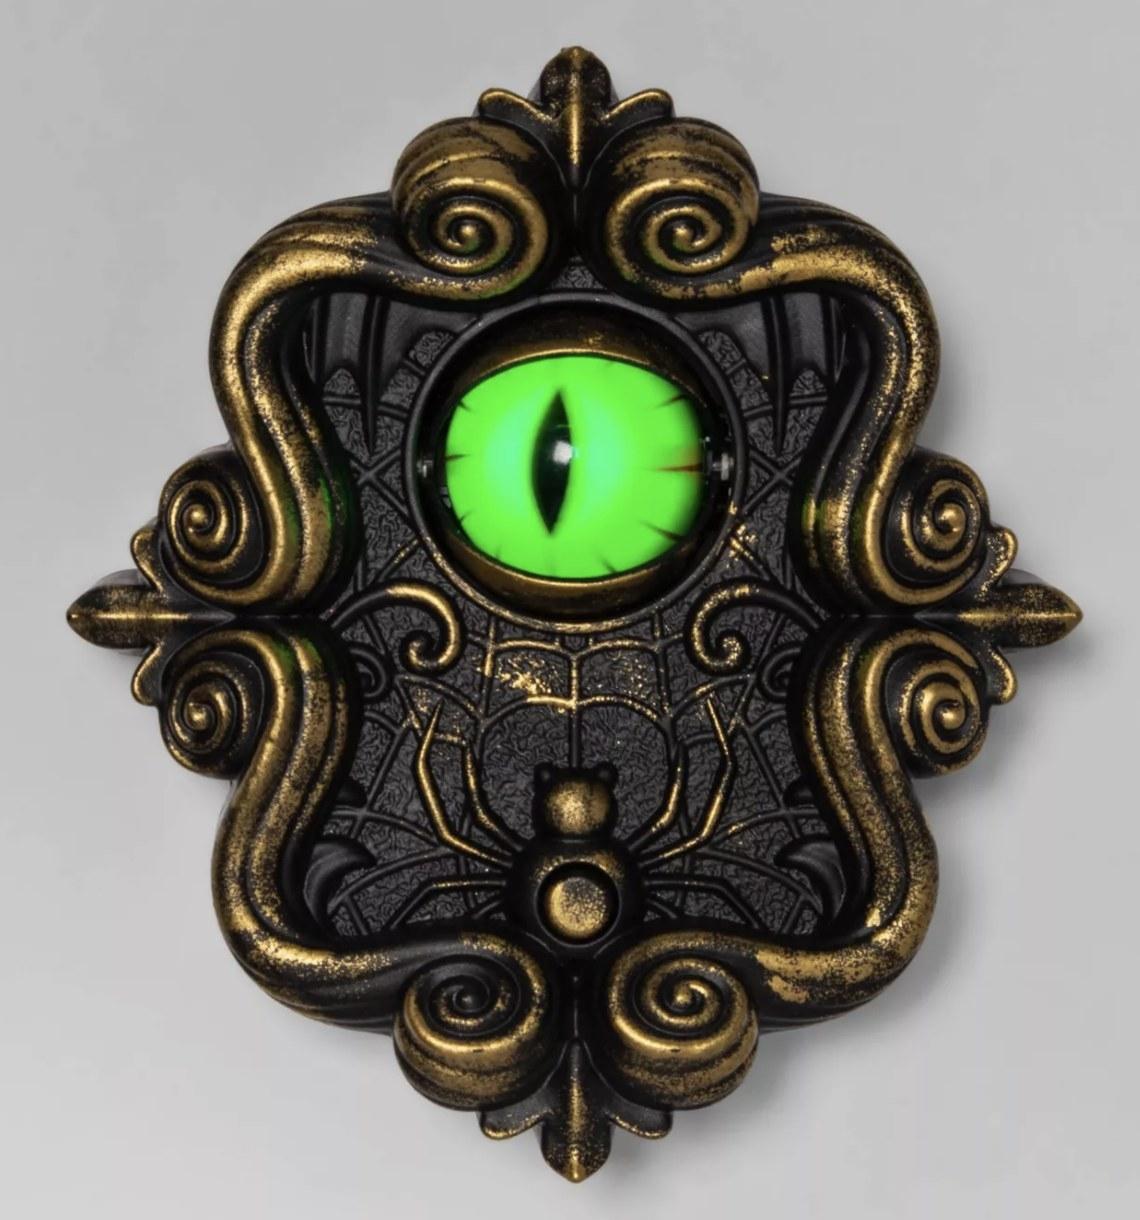 Animated dragon eye doorbell